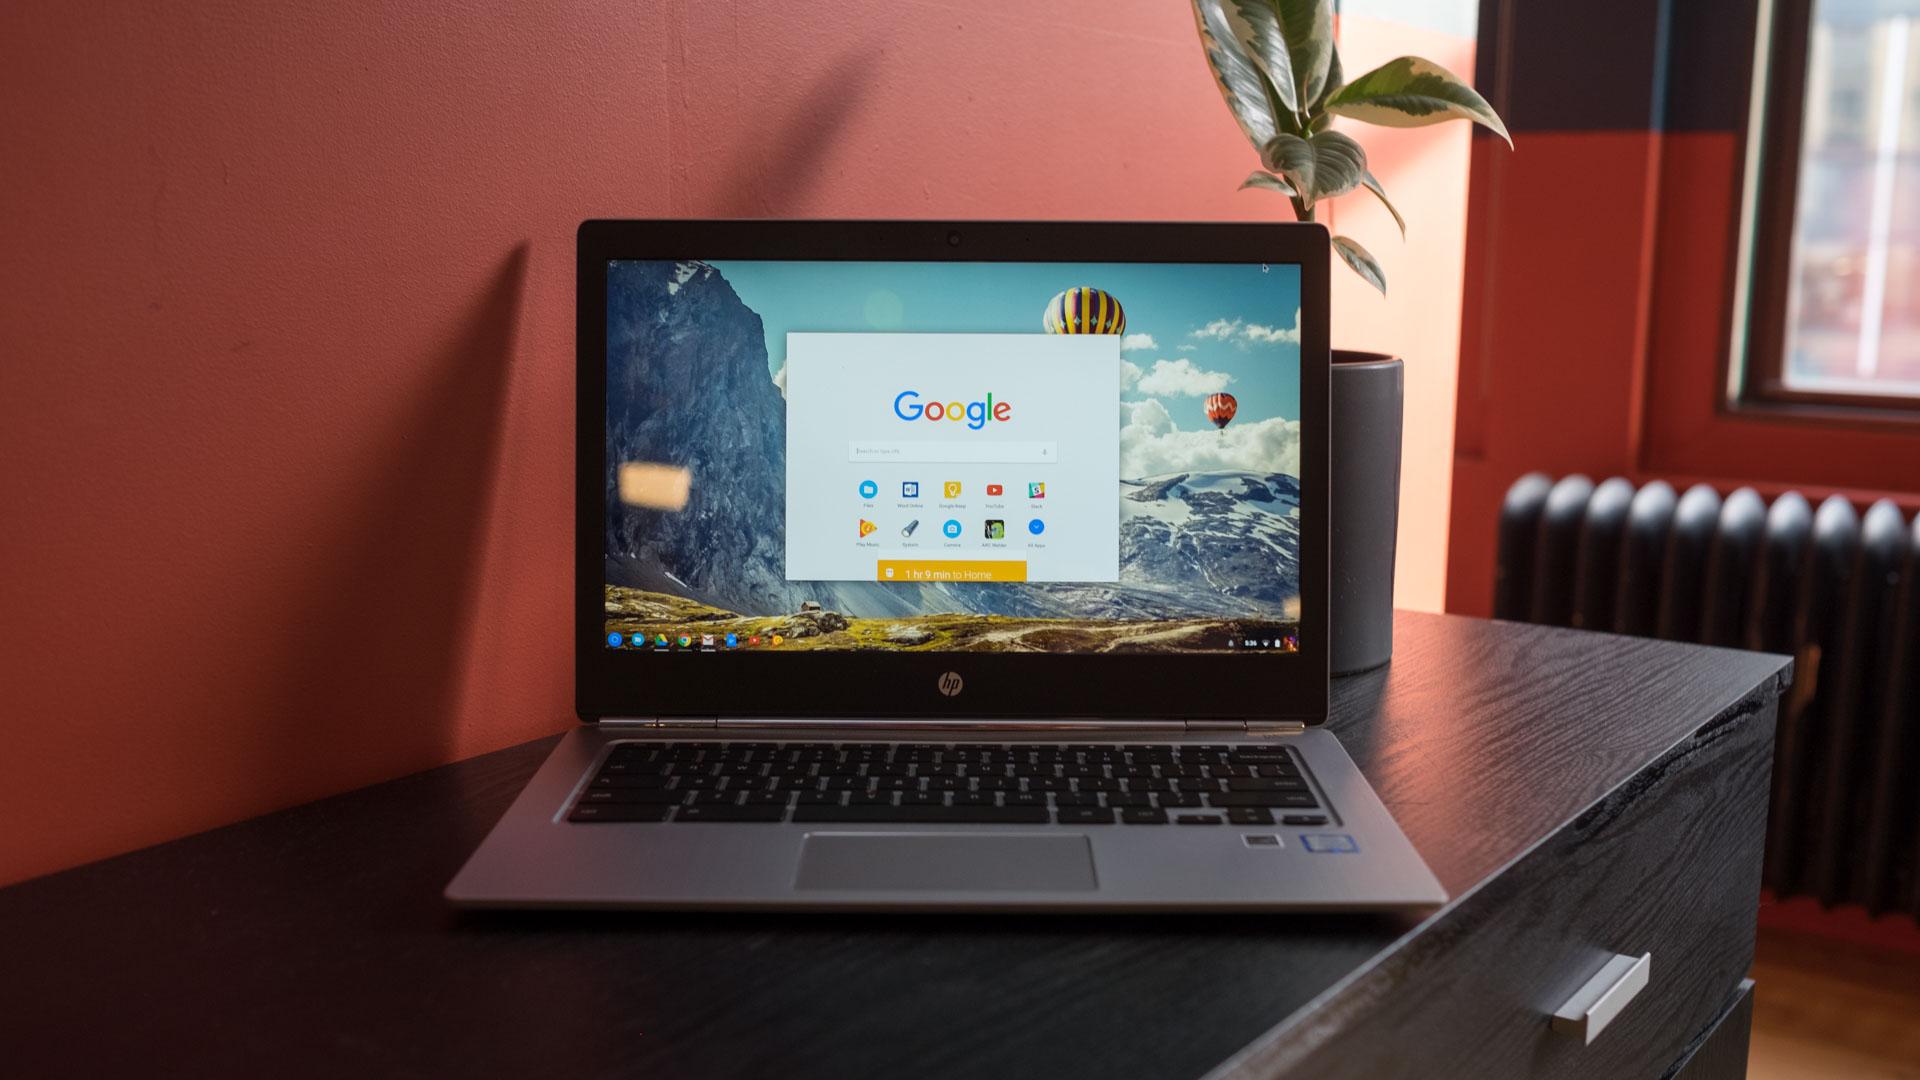 The 7 best Chromebooks of 2017: the top Chromebooks ranked